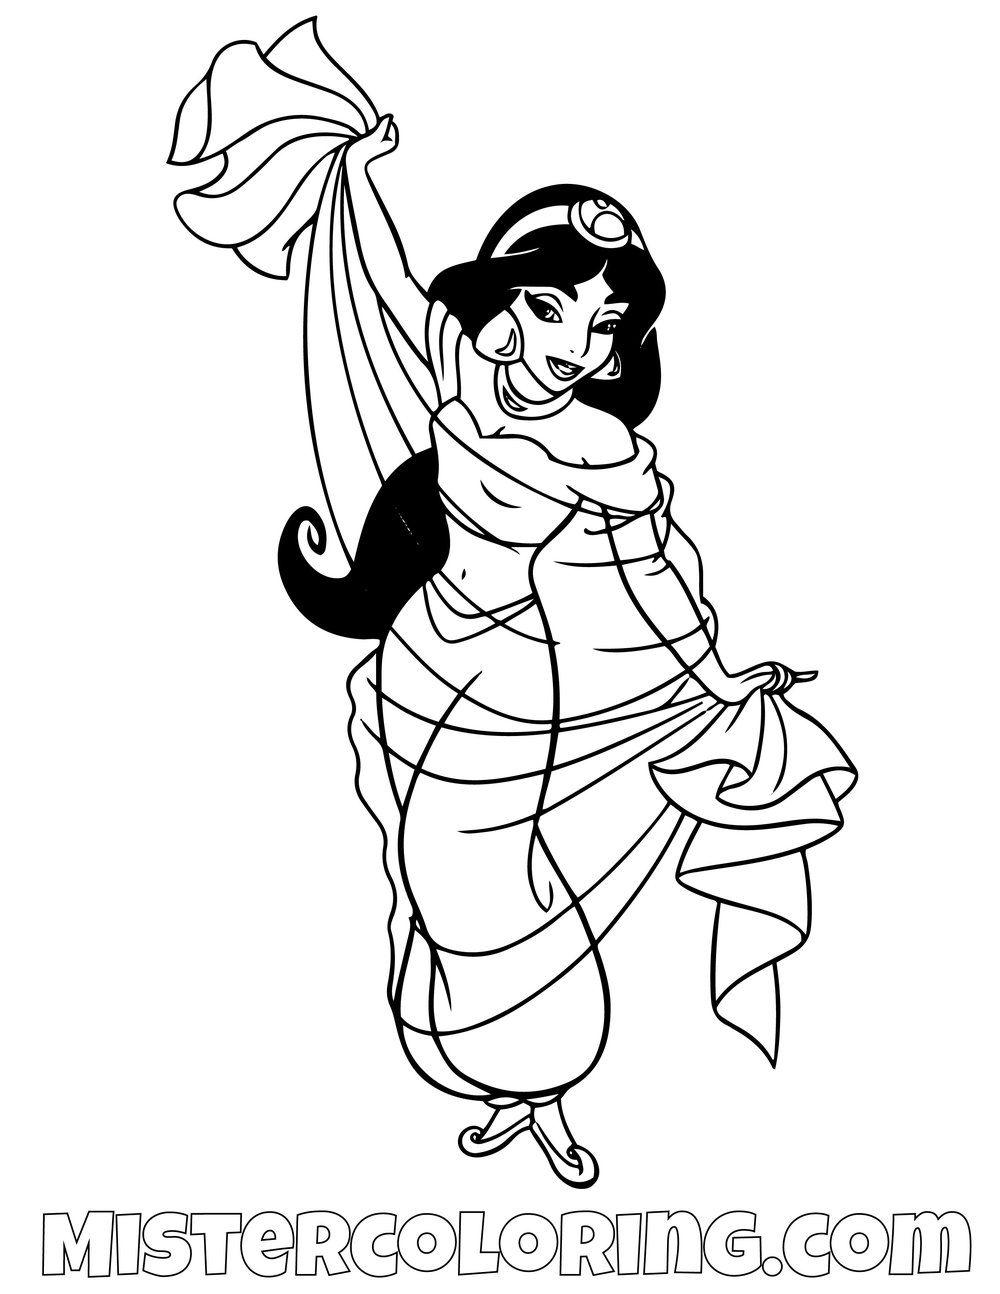 Princess Jasmine Dancing Aladdin Coloring Page Princess Coloring Pages Disney Princess Colors Disney Princess Coloring Pages